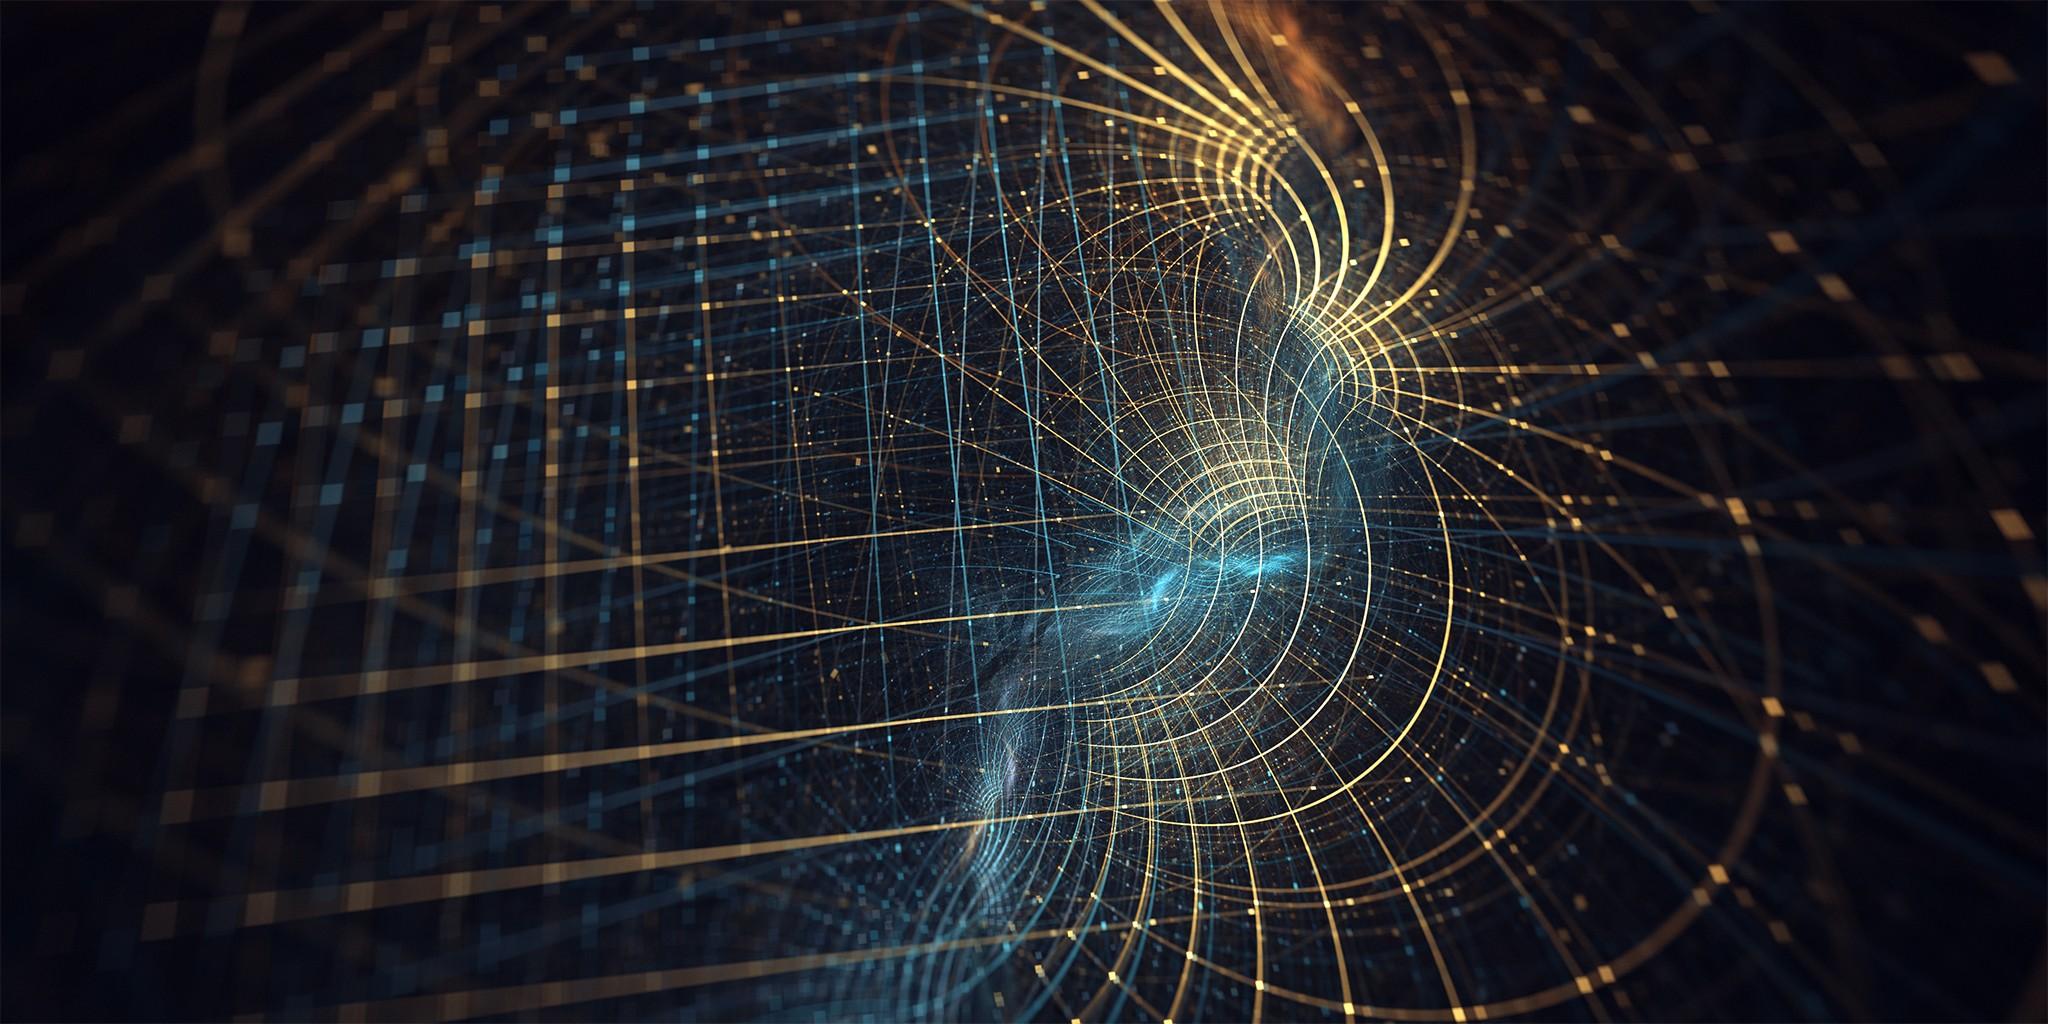 Most Inspiring Wallpaper High Resolution Mathematics - digital-art-night-abstract-3D-reflection-symmetry-waves-fractal-circle-gold-mathematics-universe-Apophysis-golden-ratio-Fibonacci-sequence-light-material-line-close-up-macro-photography-invertebrate-spider-web-128312  You Should Have_743579.jpg